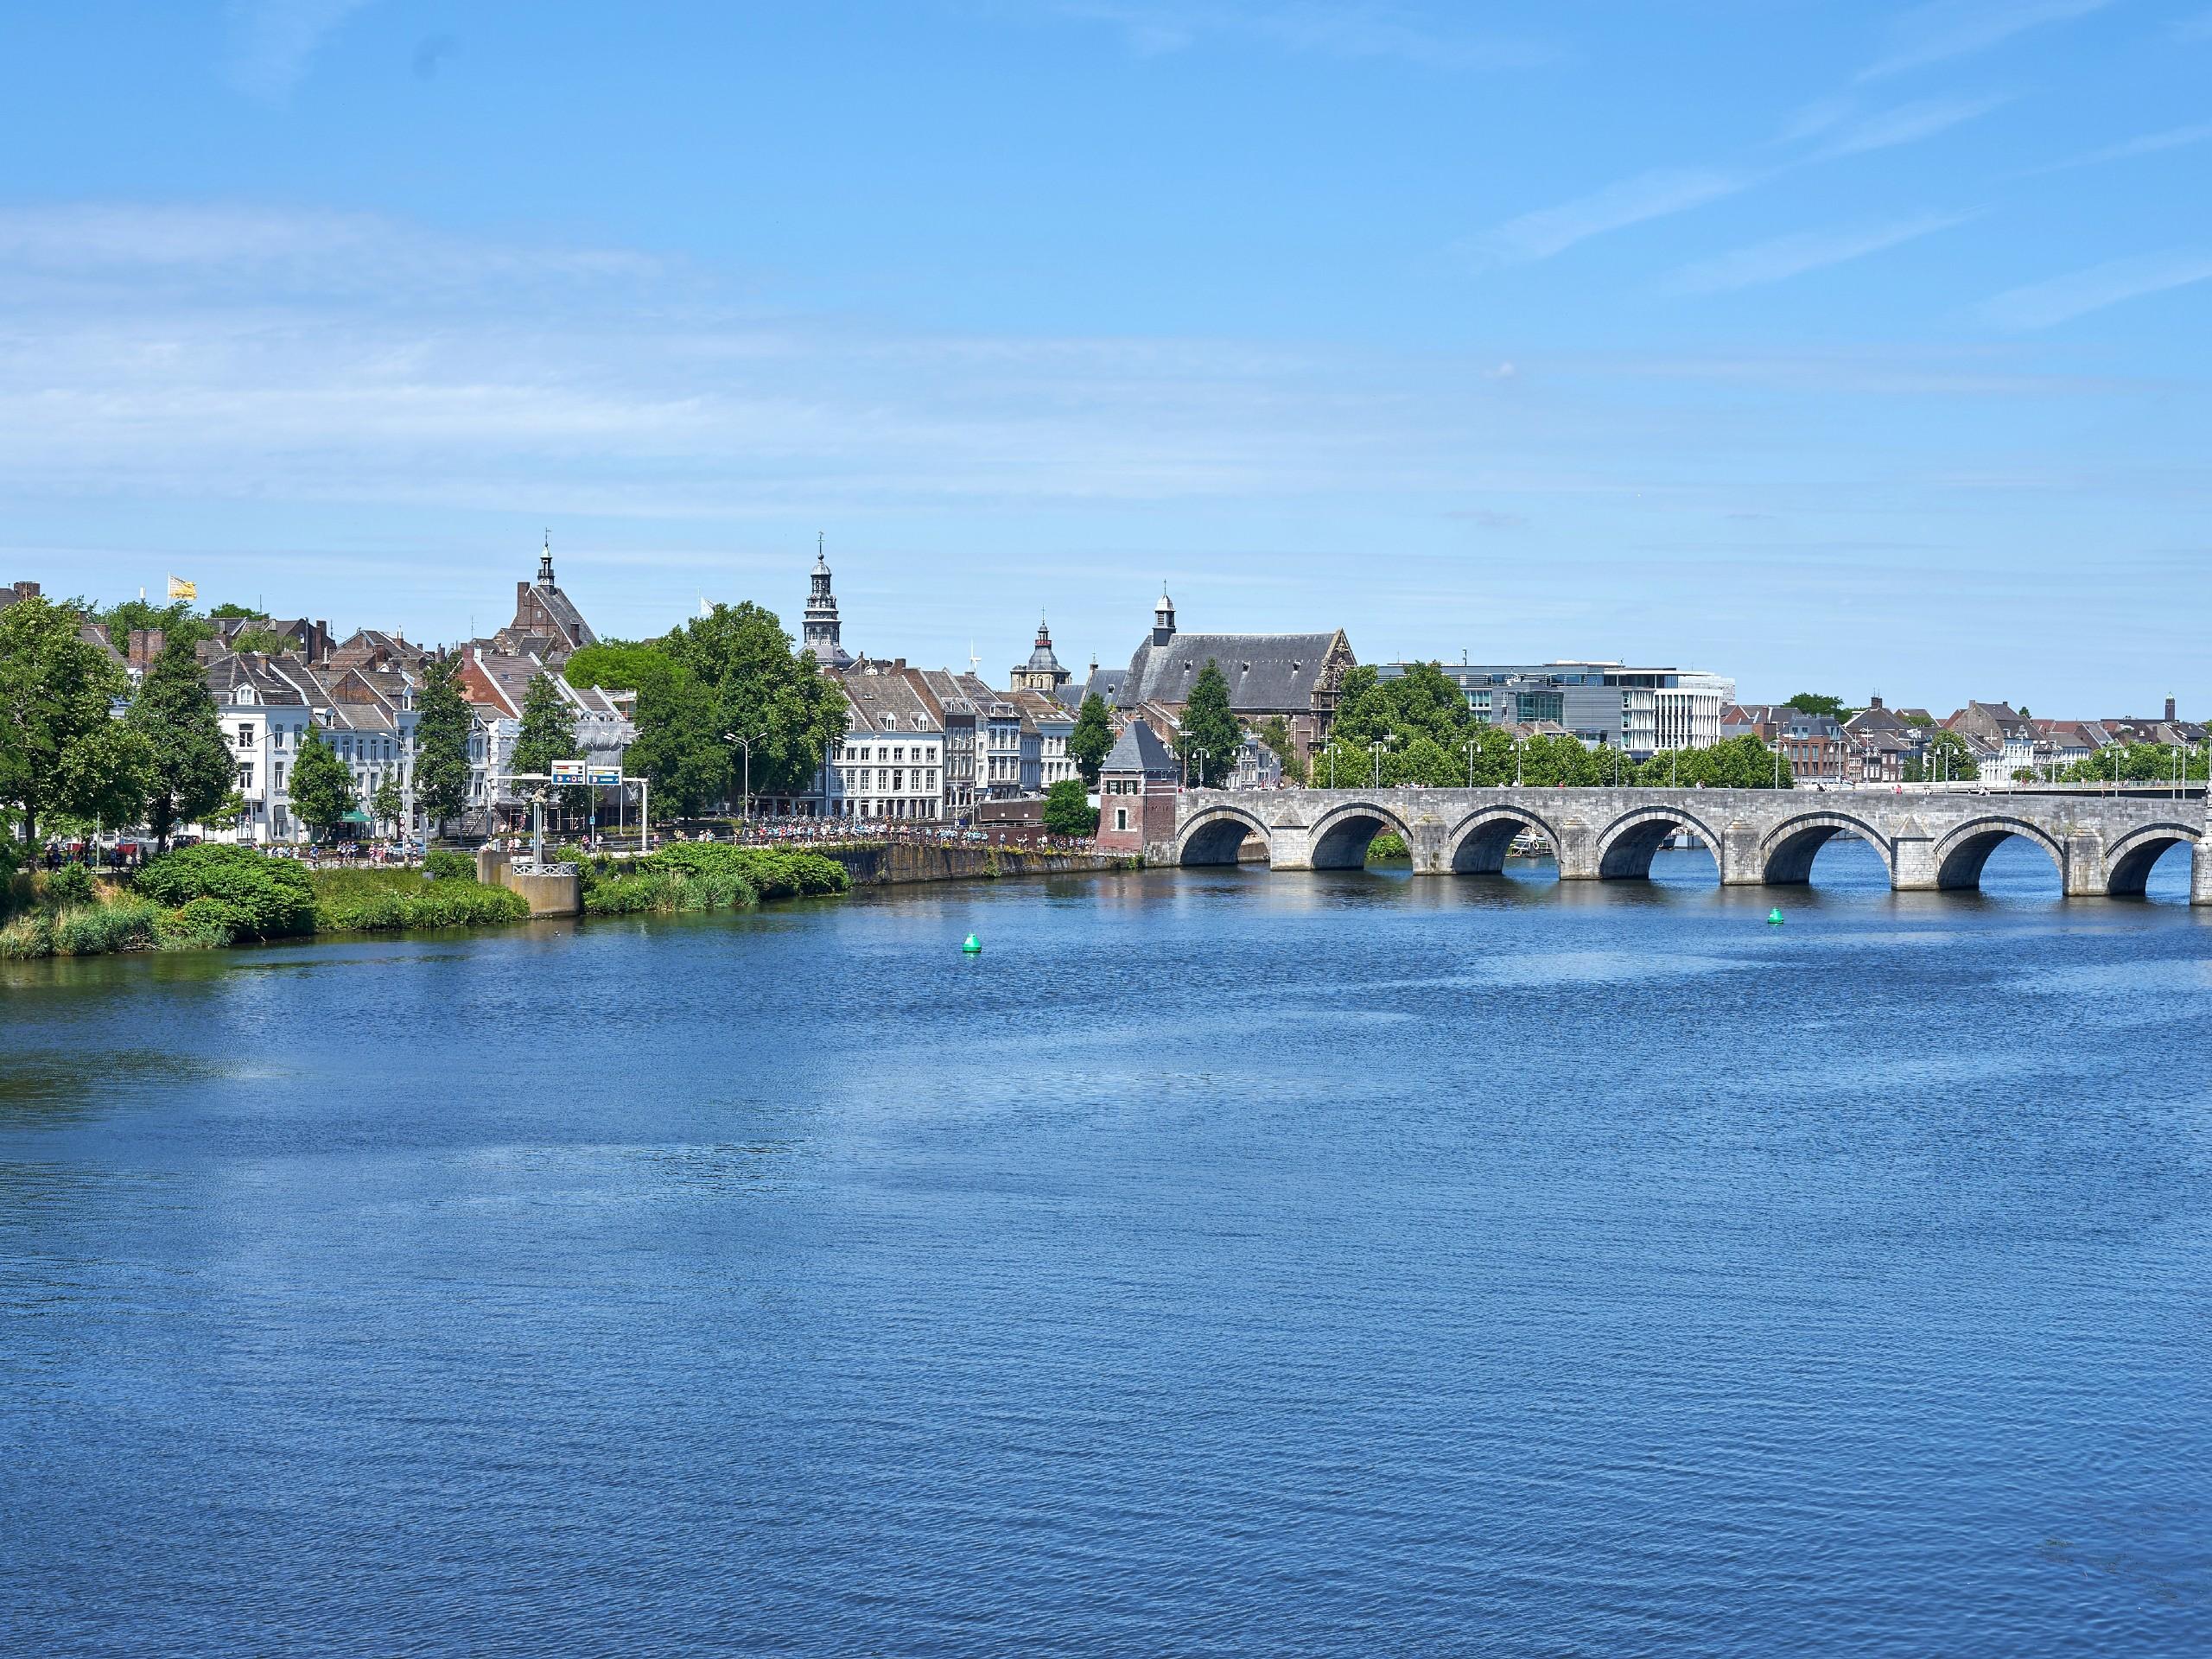 Bridge over the river in Netherlands